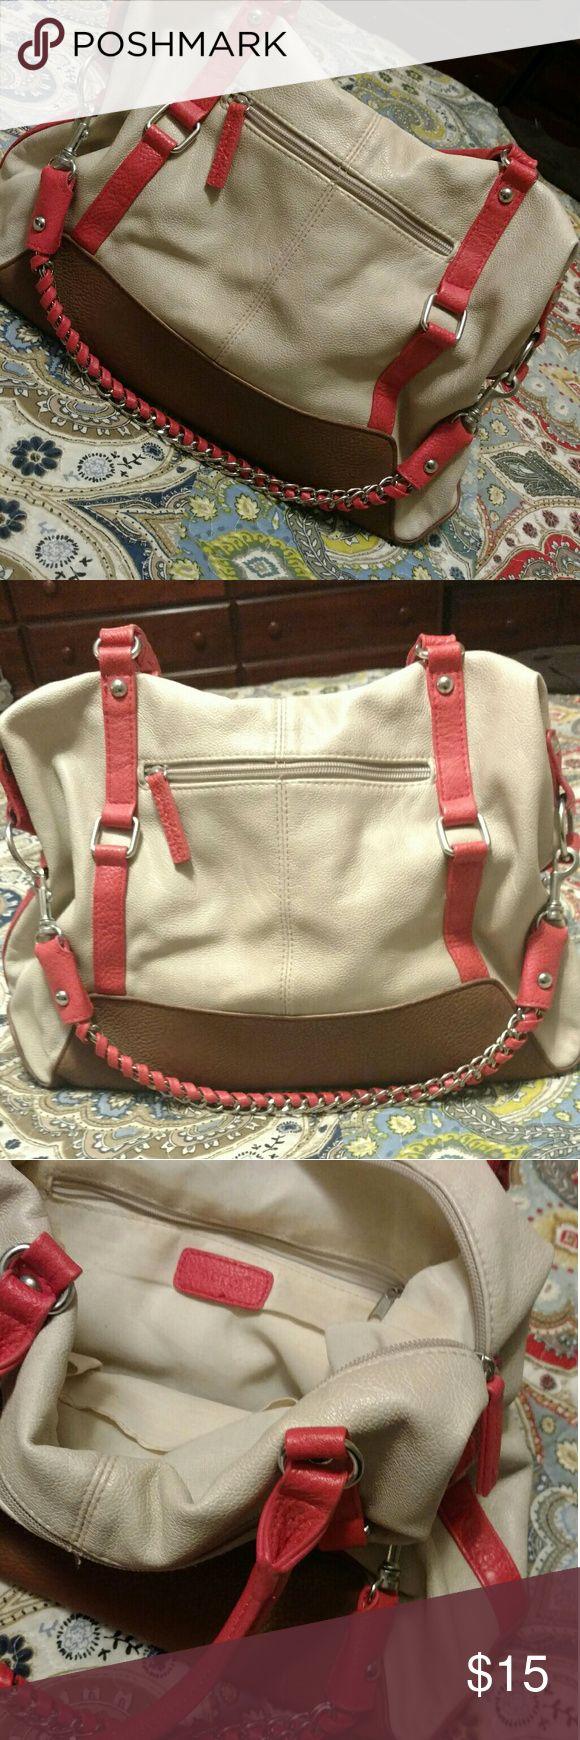 Tan, cream and coral handbag. GUC. Apt 9 brand. Tan, cream and coral handbag. GUC. Apt 9 brand. Apt. 9 Bags